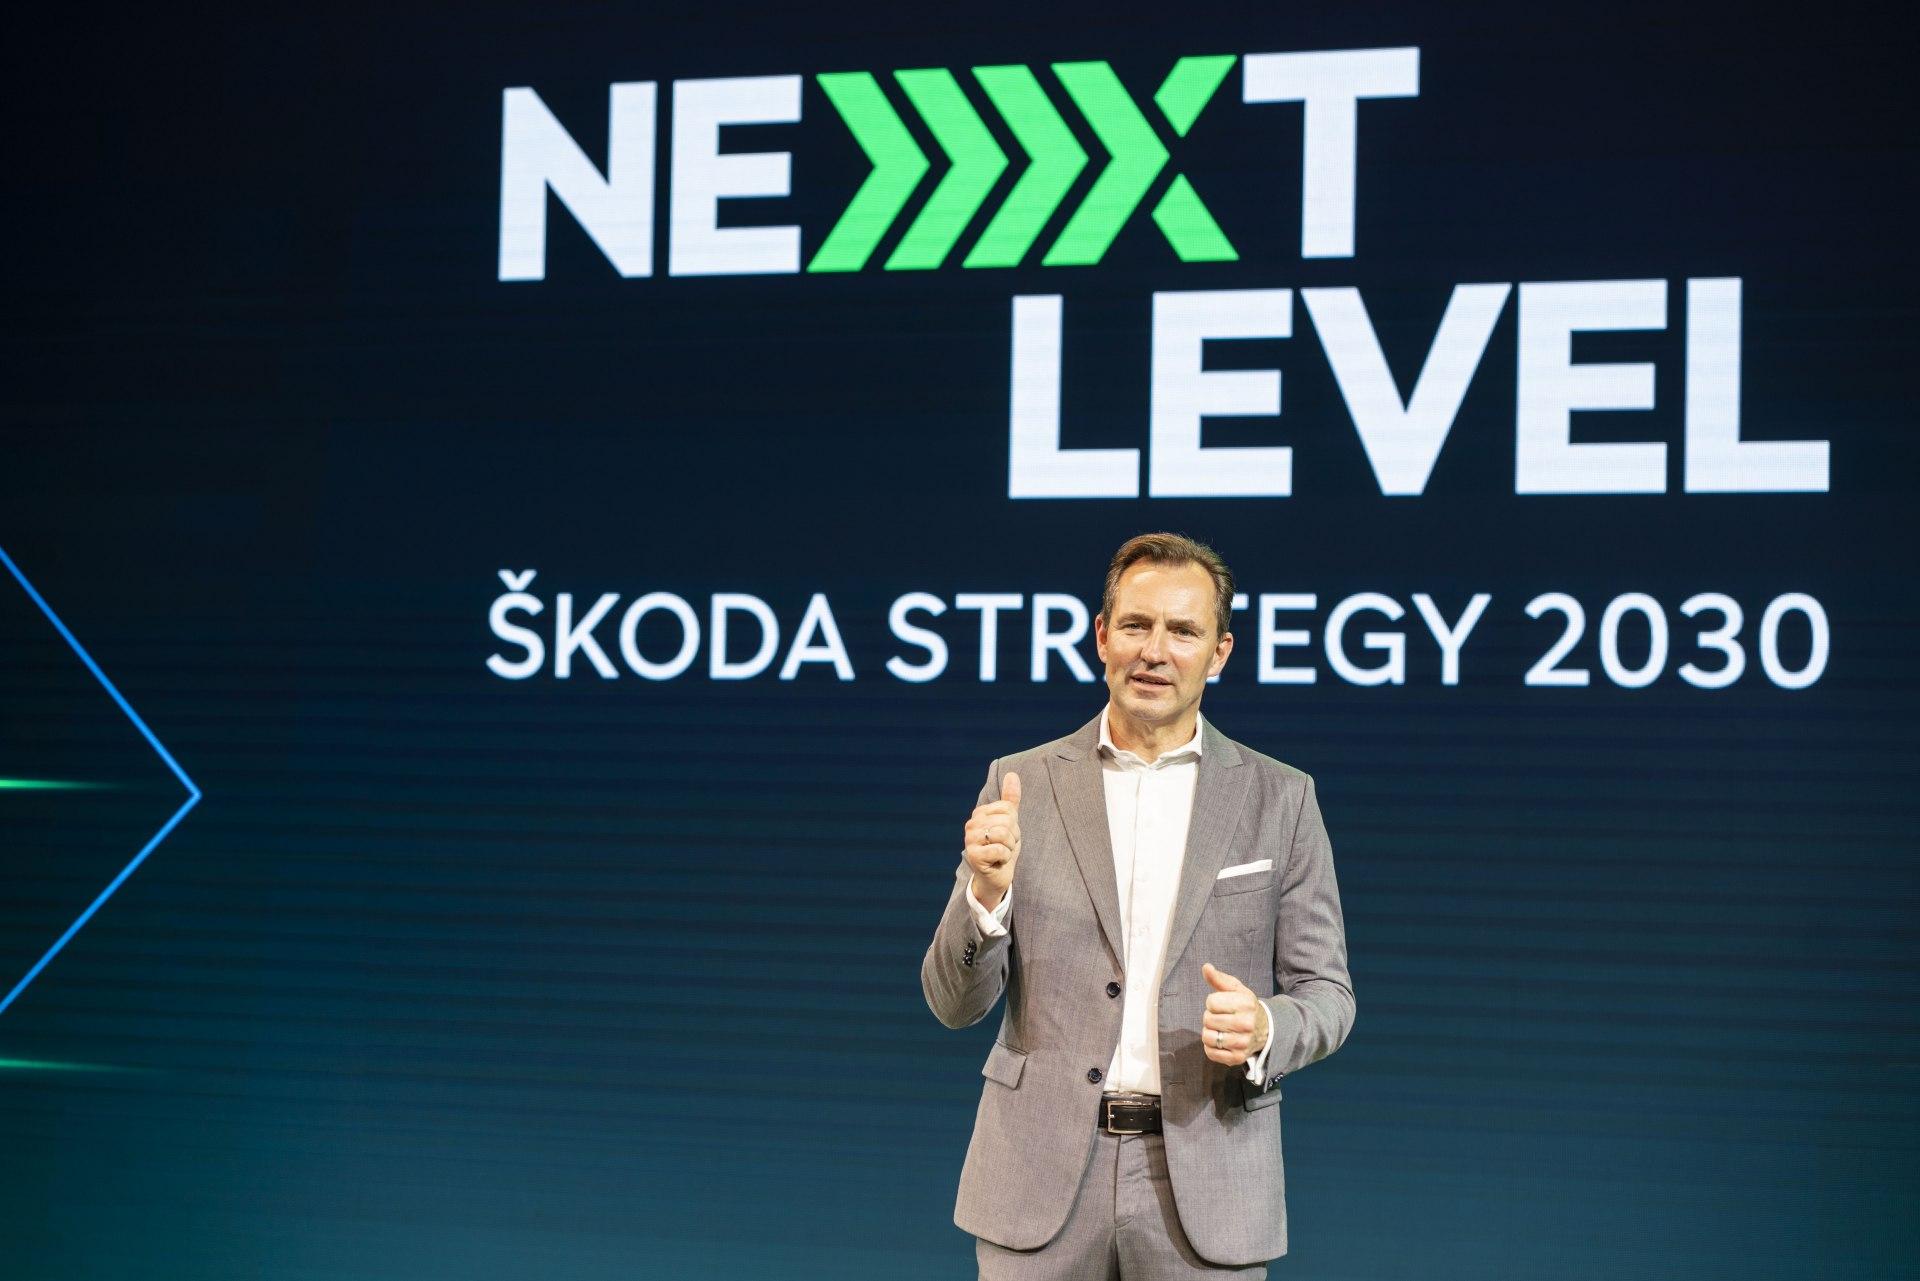 SKODA AUTO NEXT LEVEL SKODA STRATEGY 2030 THOMAS SCHAEFER CEO 2 Πώς θα είναι η Skoda το 2030 Skoda, ειδήσεις, Νέα